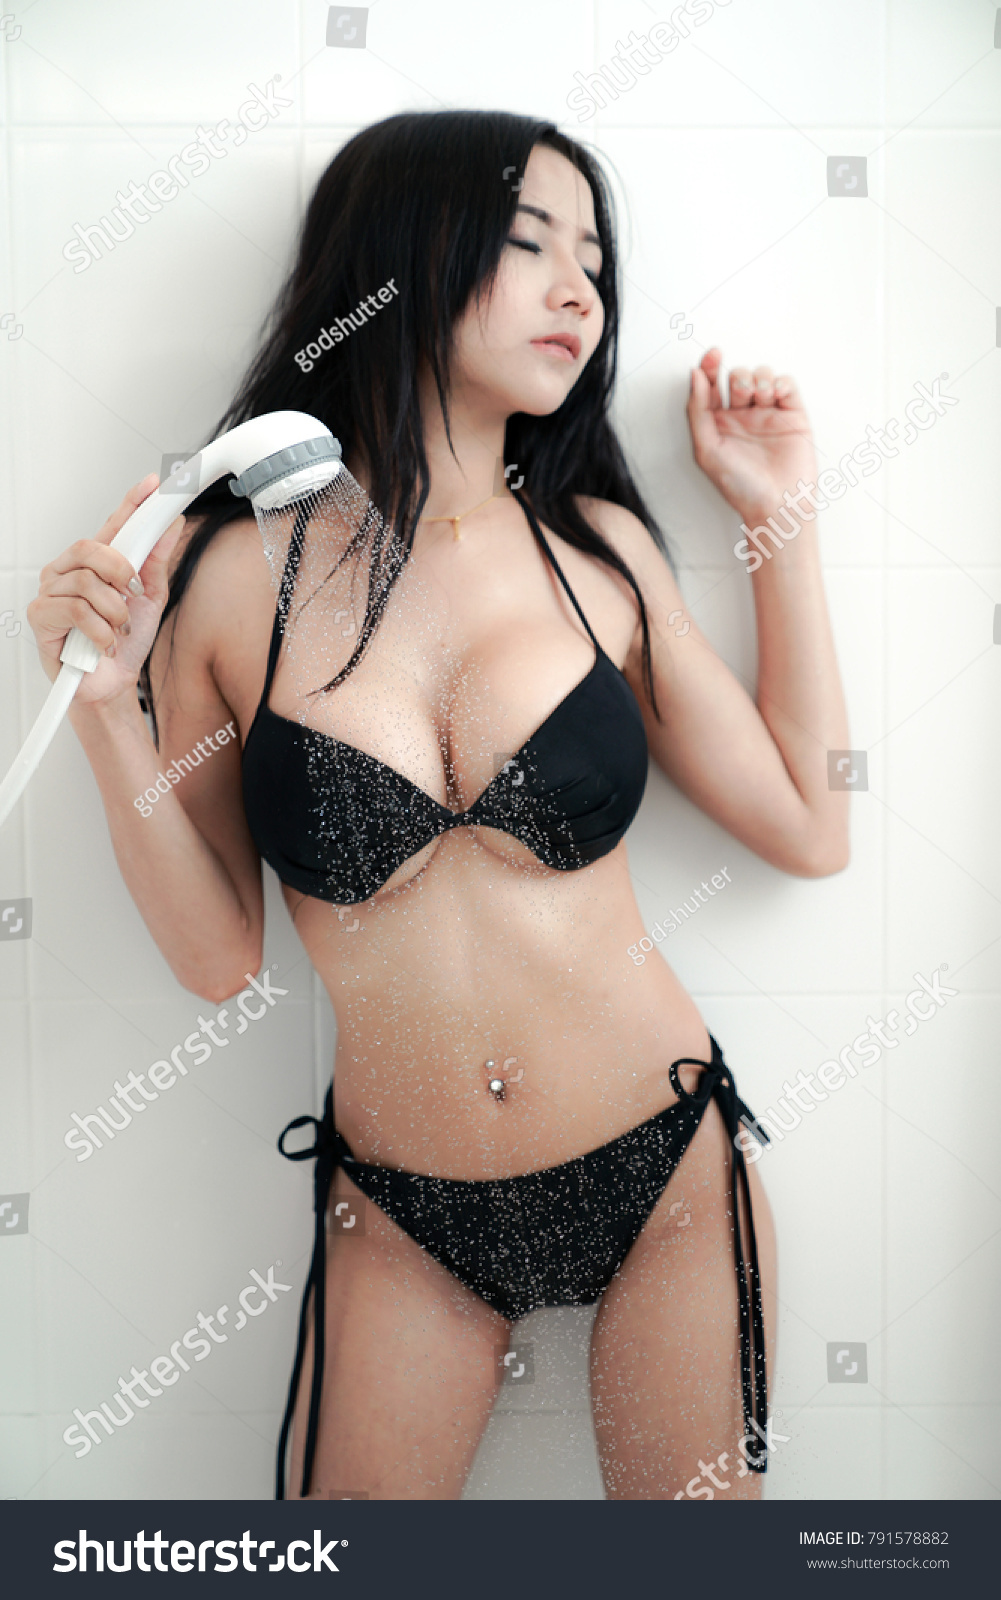 Big Breast Asian